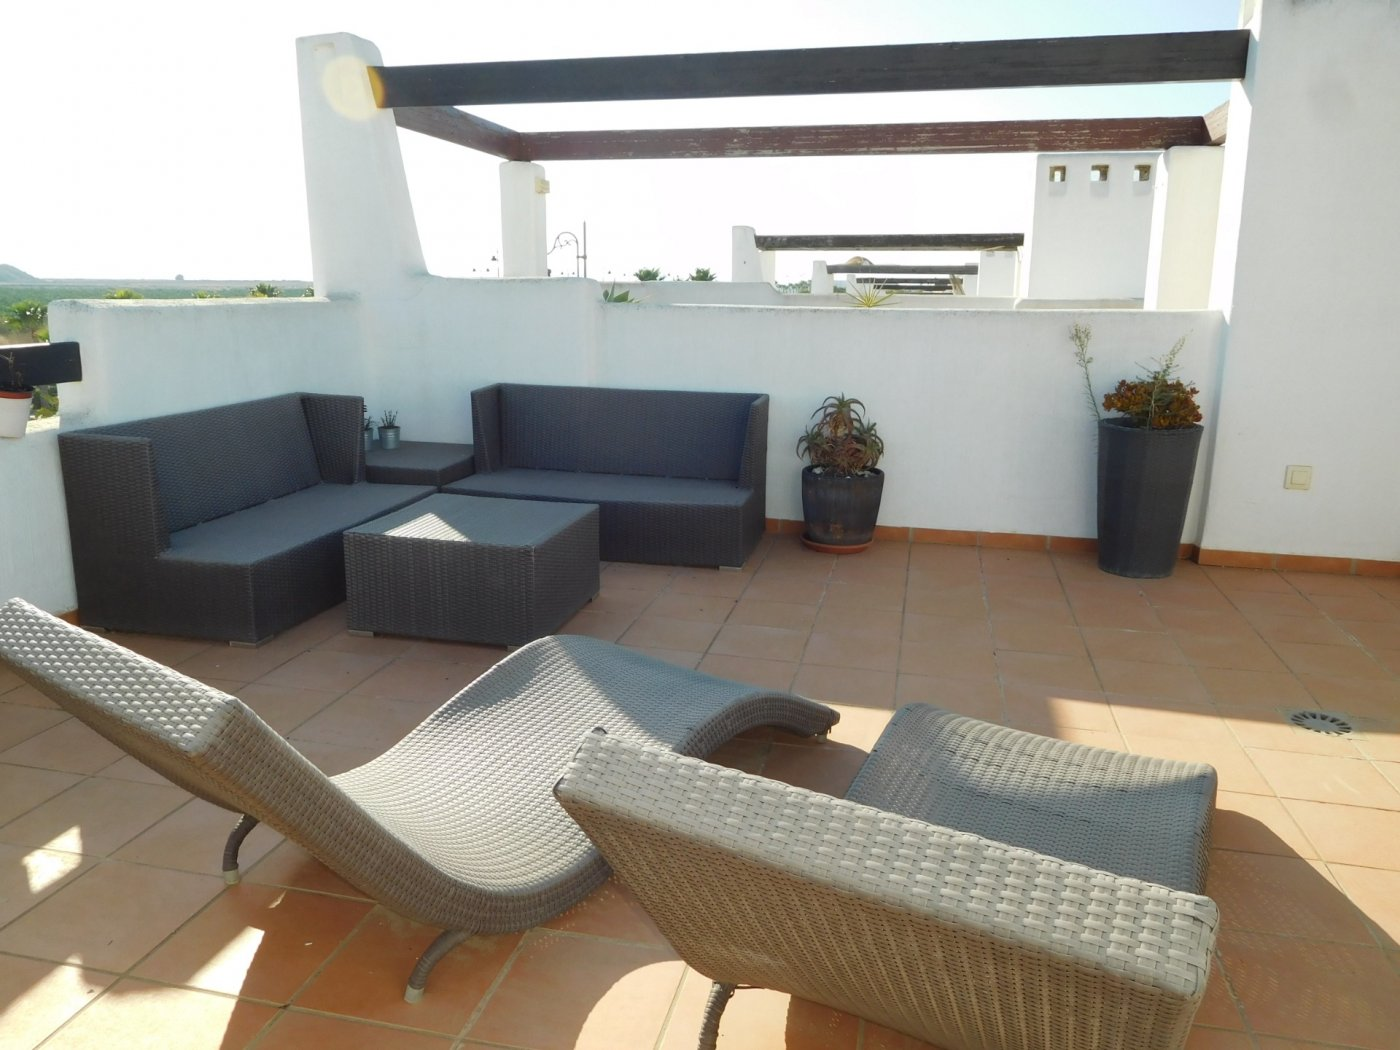 Gallery Image 13 of Apartment For rent in Condado De Alhama, Alhama De Murcia With Pool